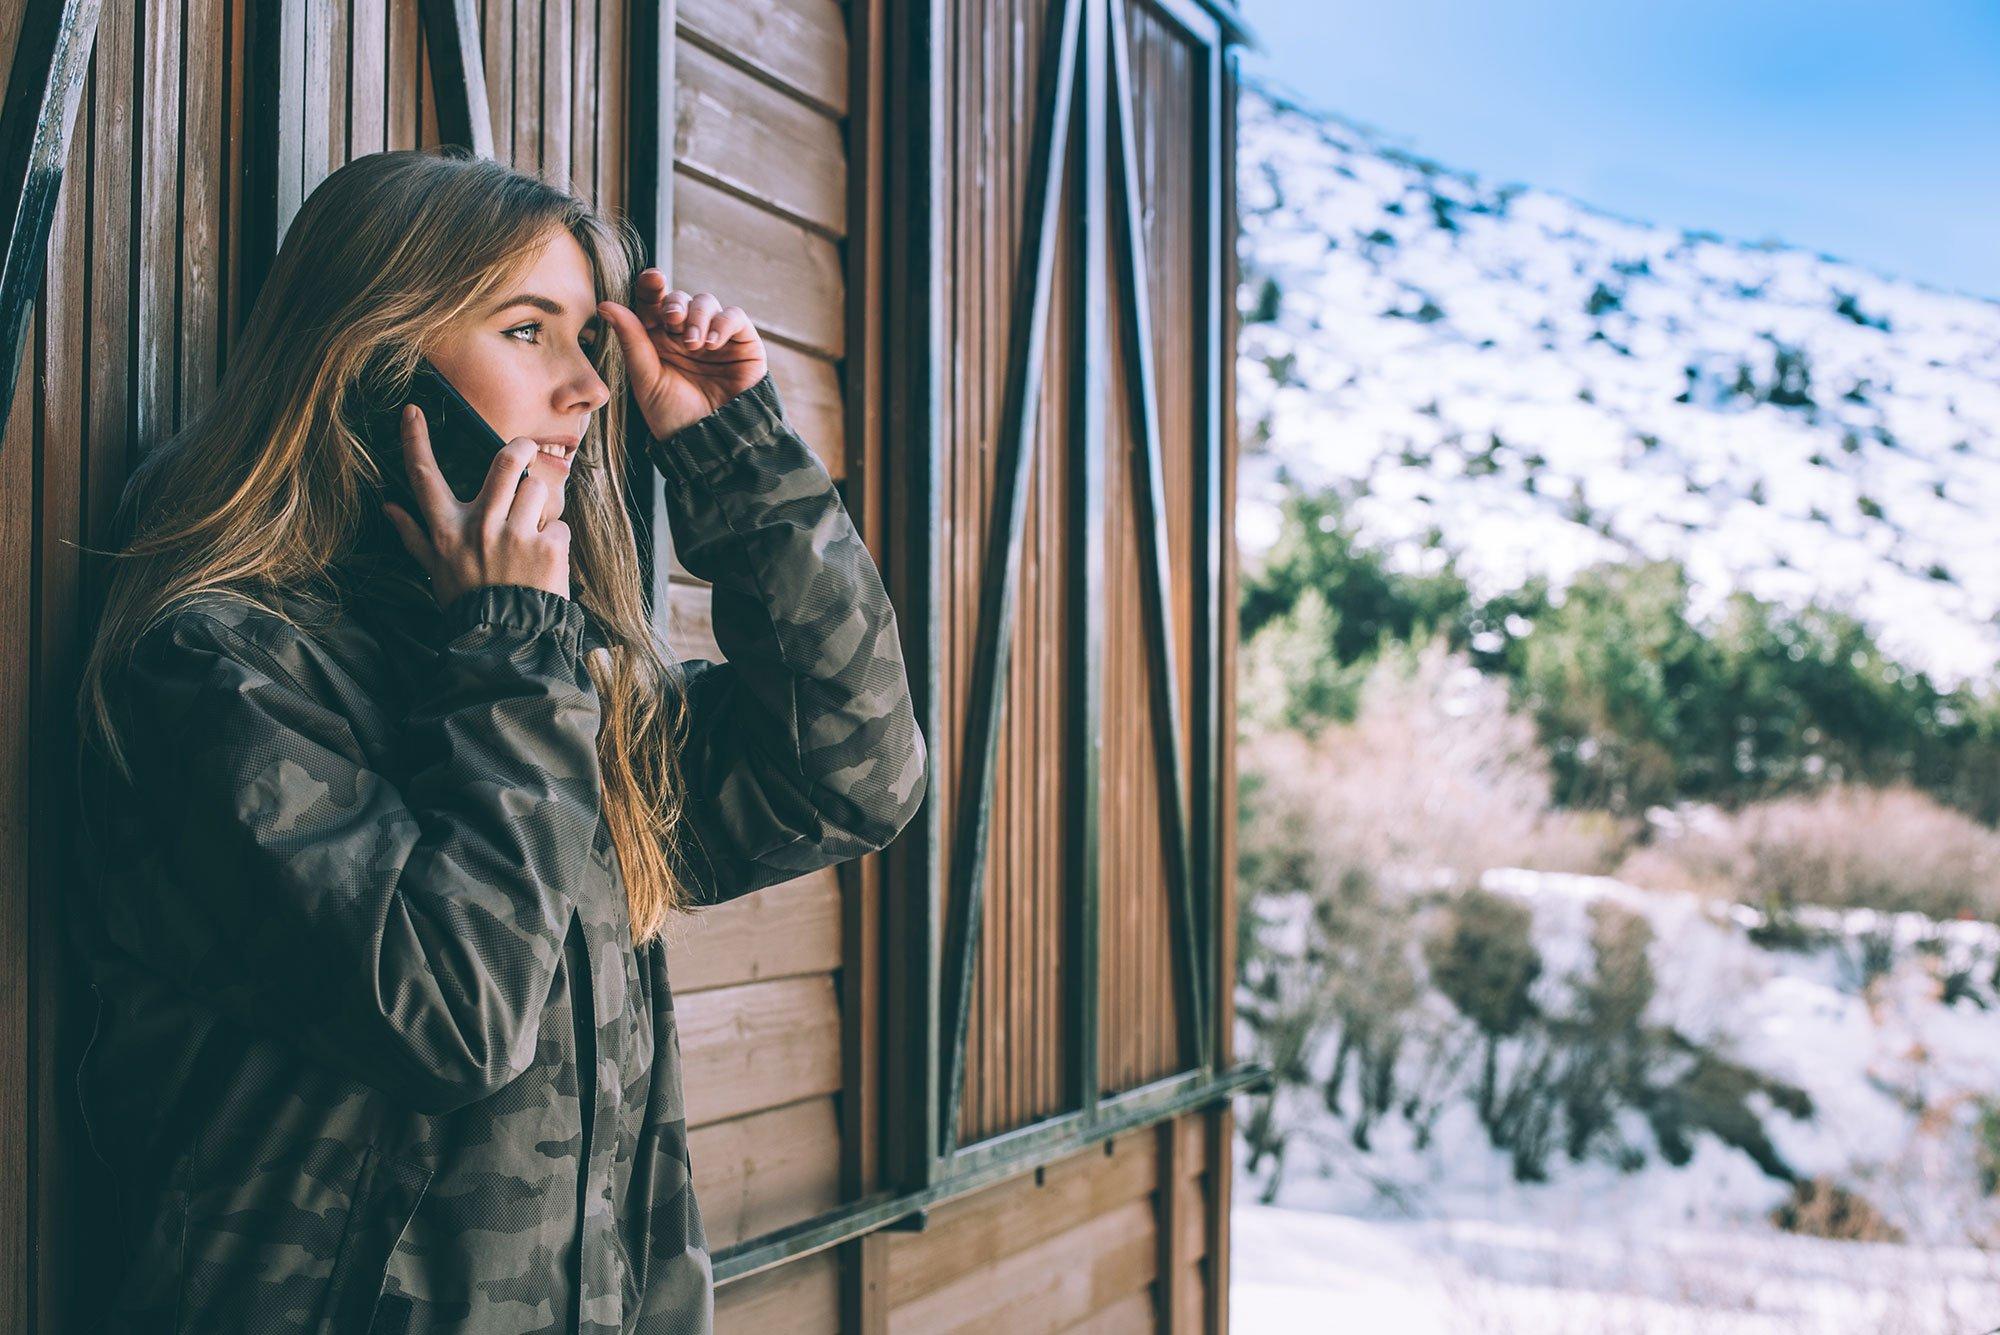 woman-mobile-phone-rural-cabin-mountain-winter-snow